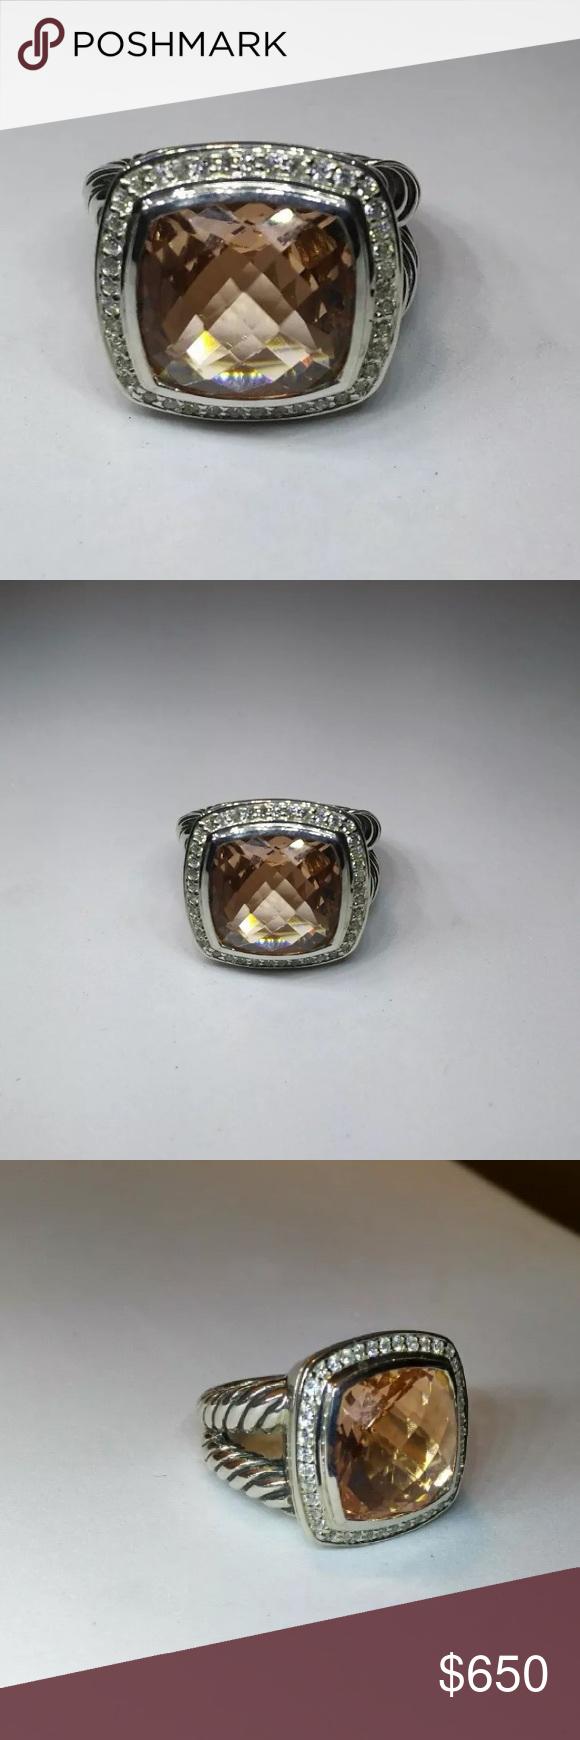 diamond david yurman 14mm albion morganite ring size 6 david yurman sterling silver